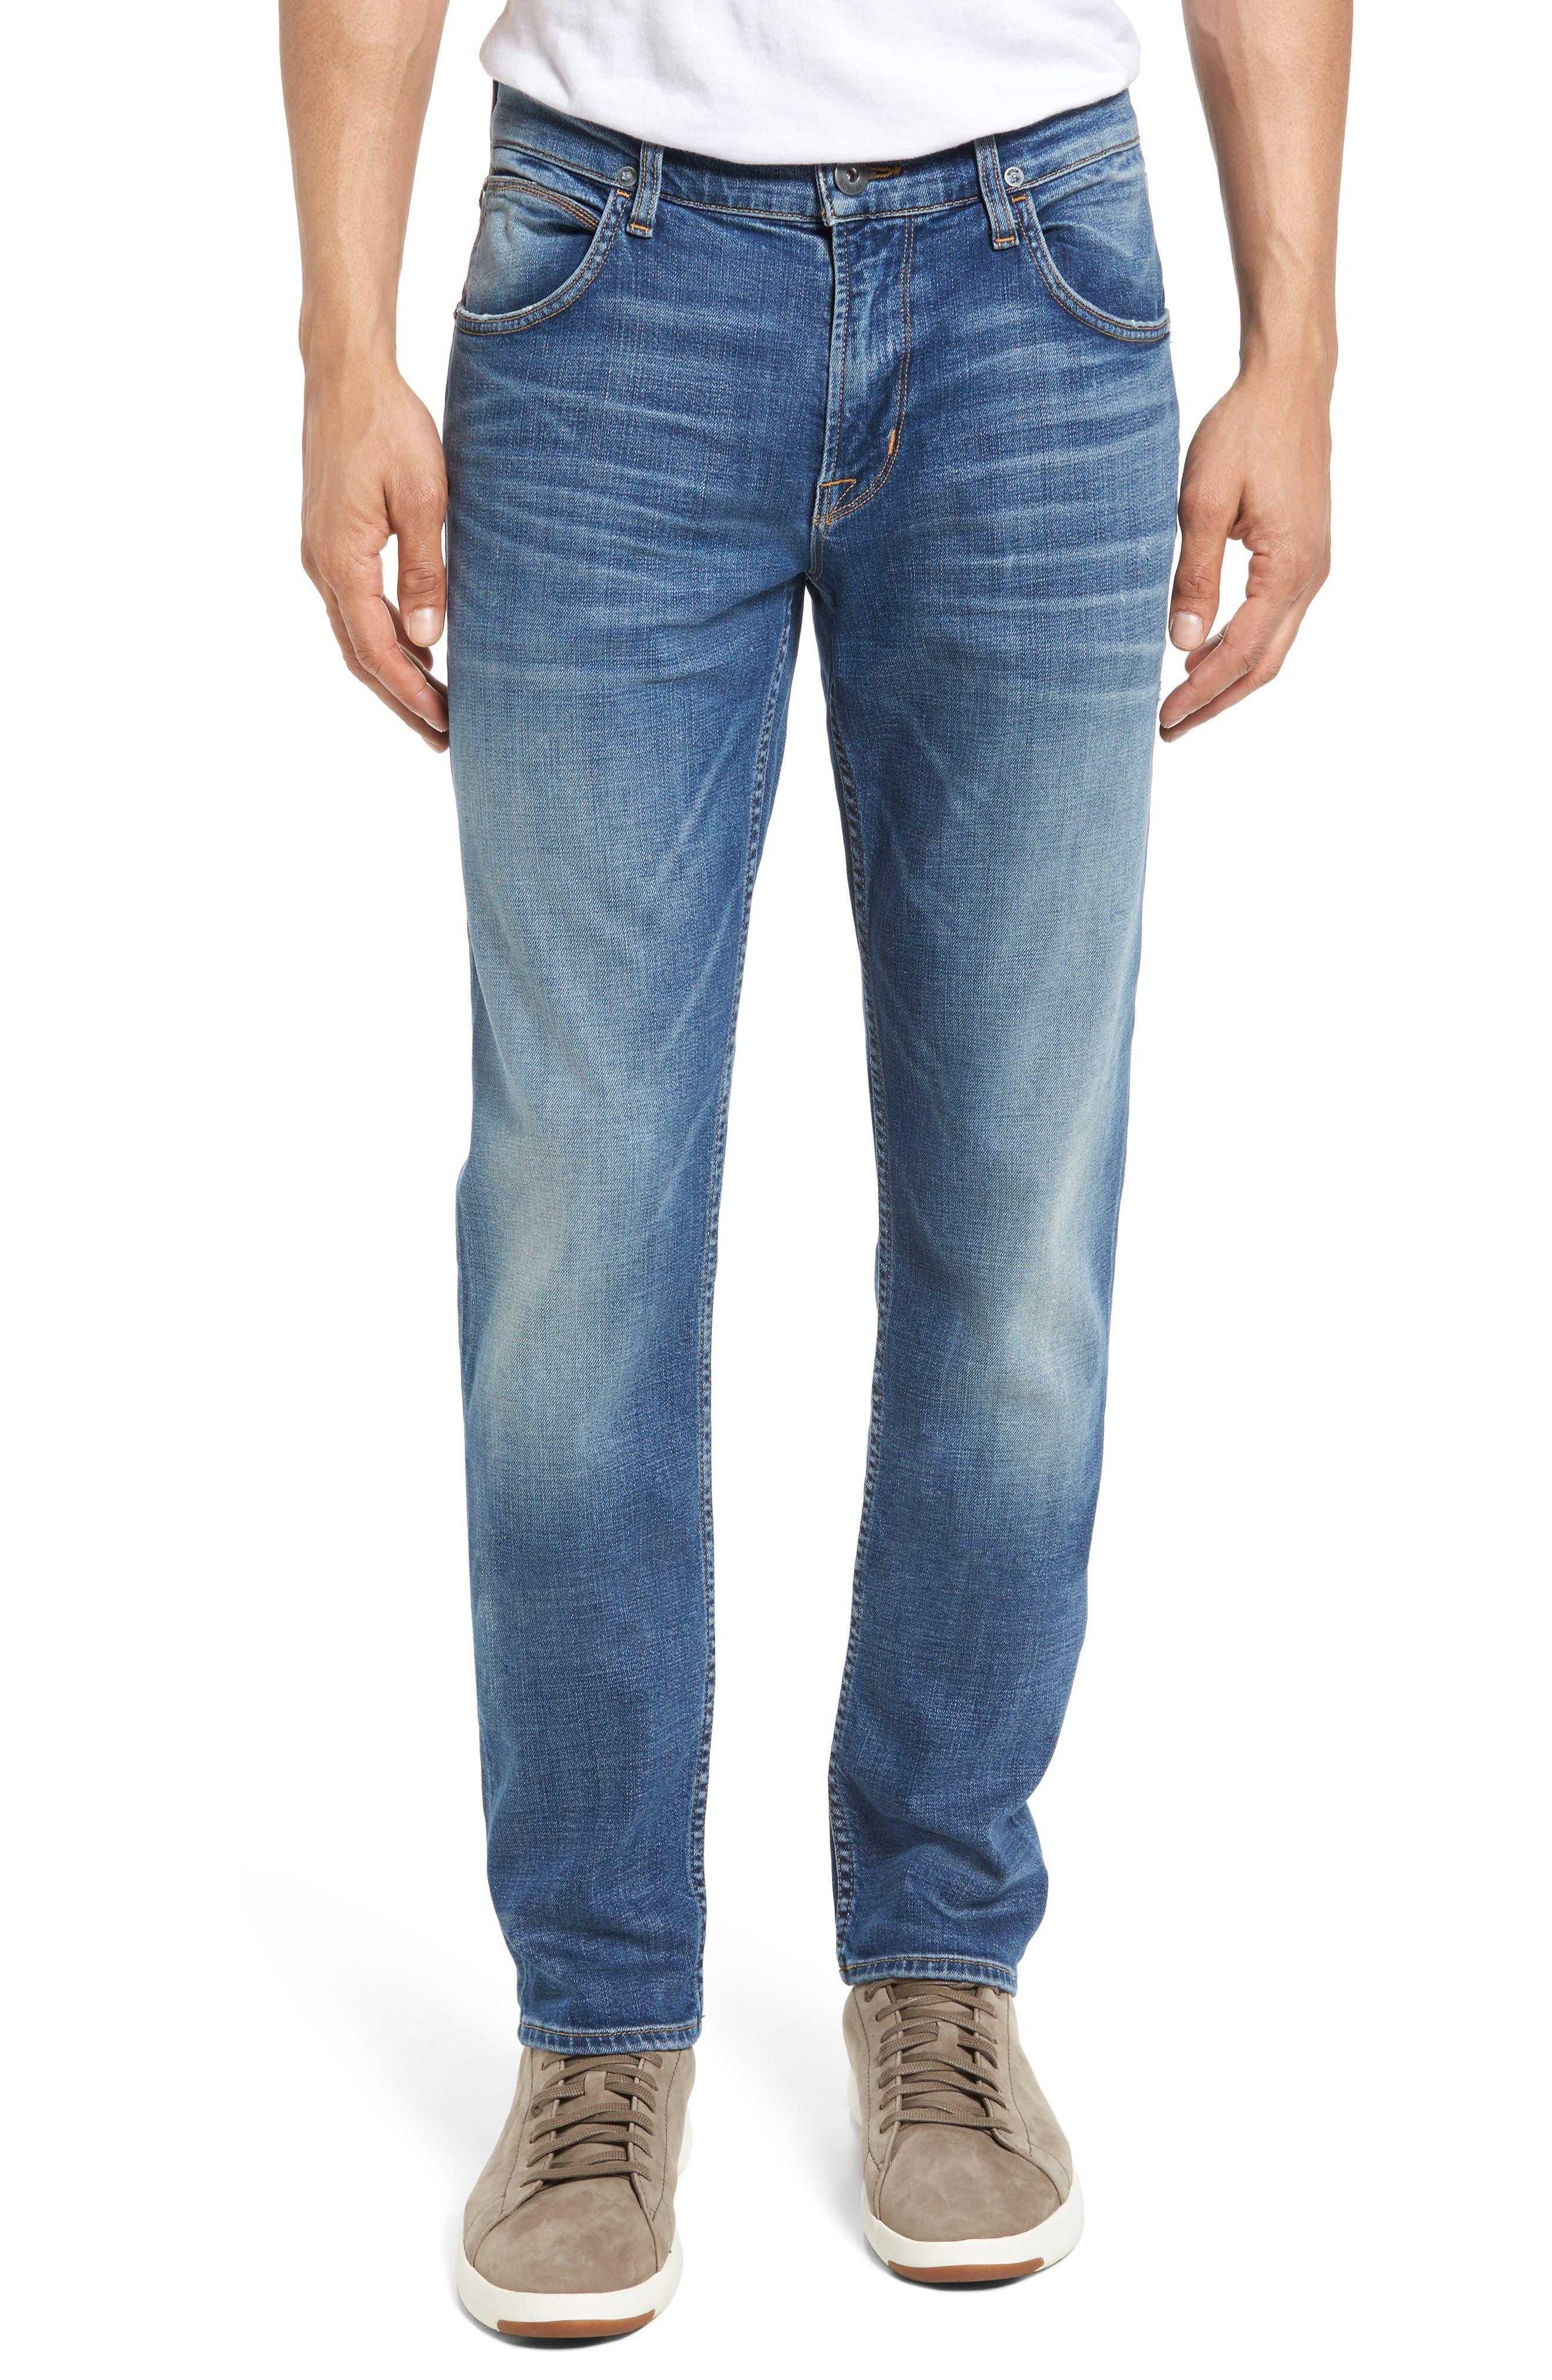 Blake Slim Fit Jeans,                             Main thumbnail 1, color,                             453